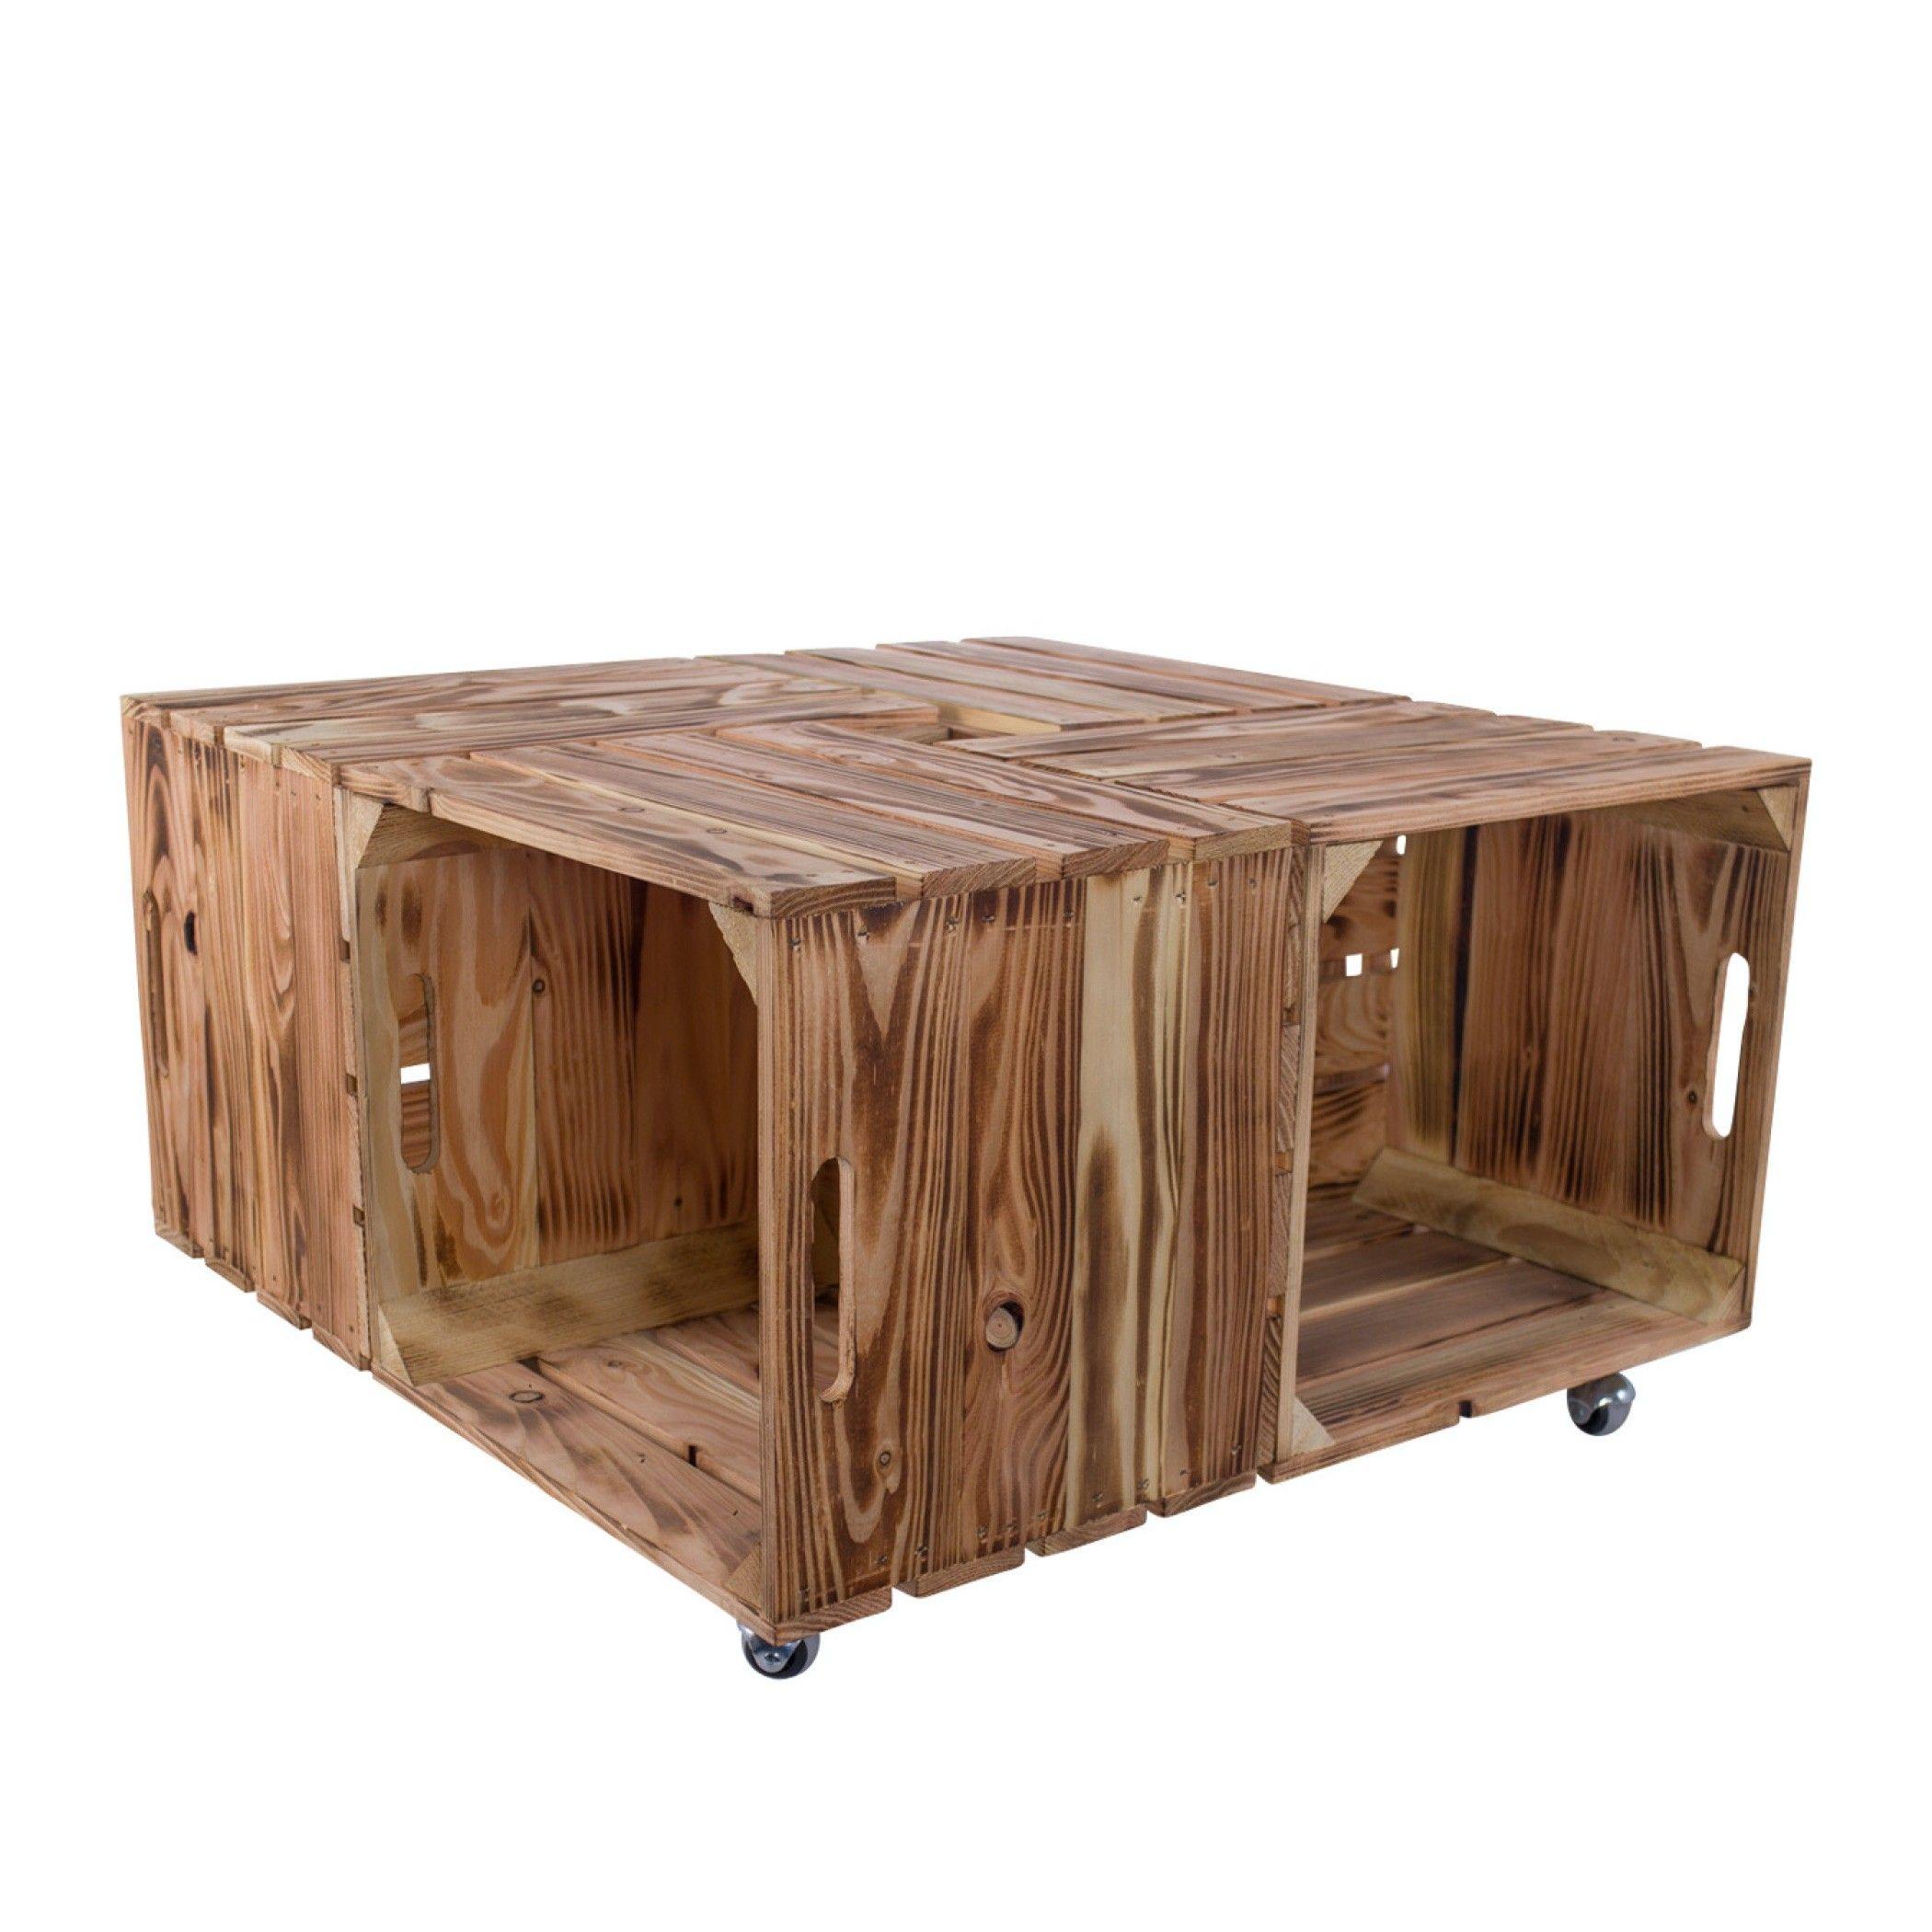 Table Basse Ikea Kallax Flambee Caisses Co